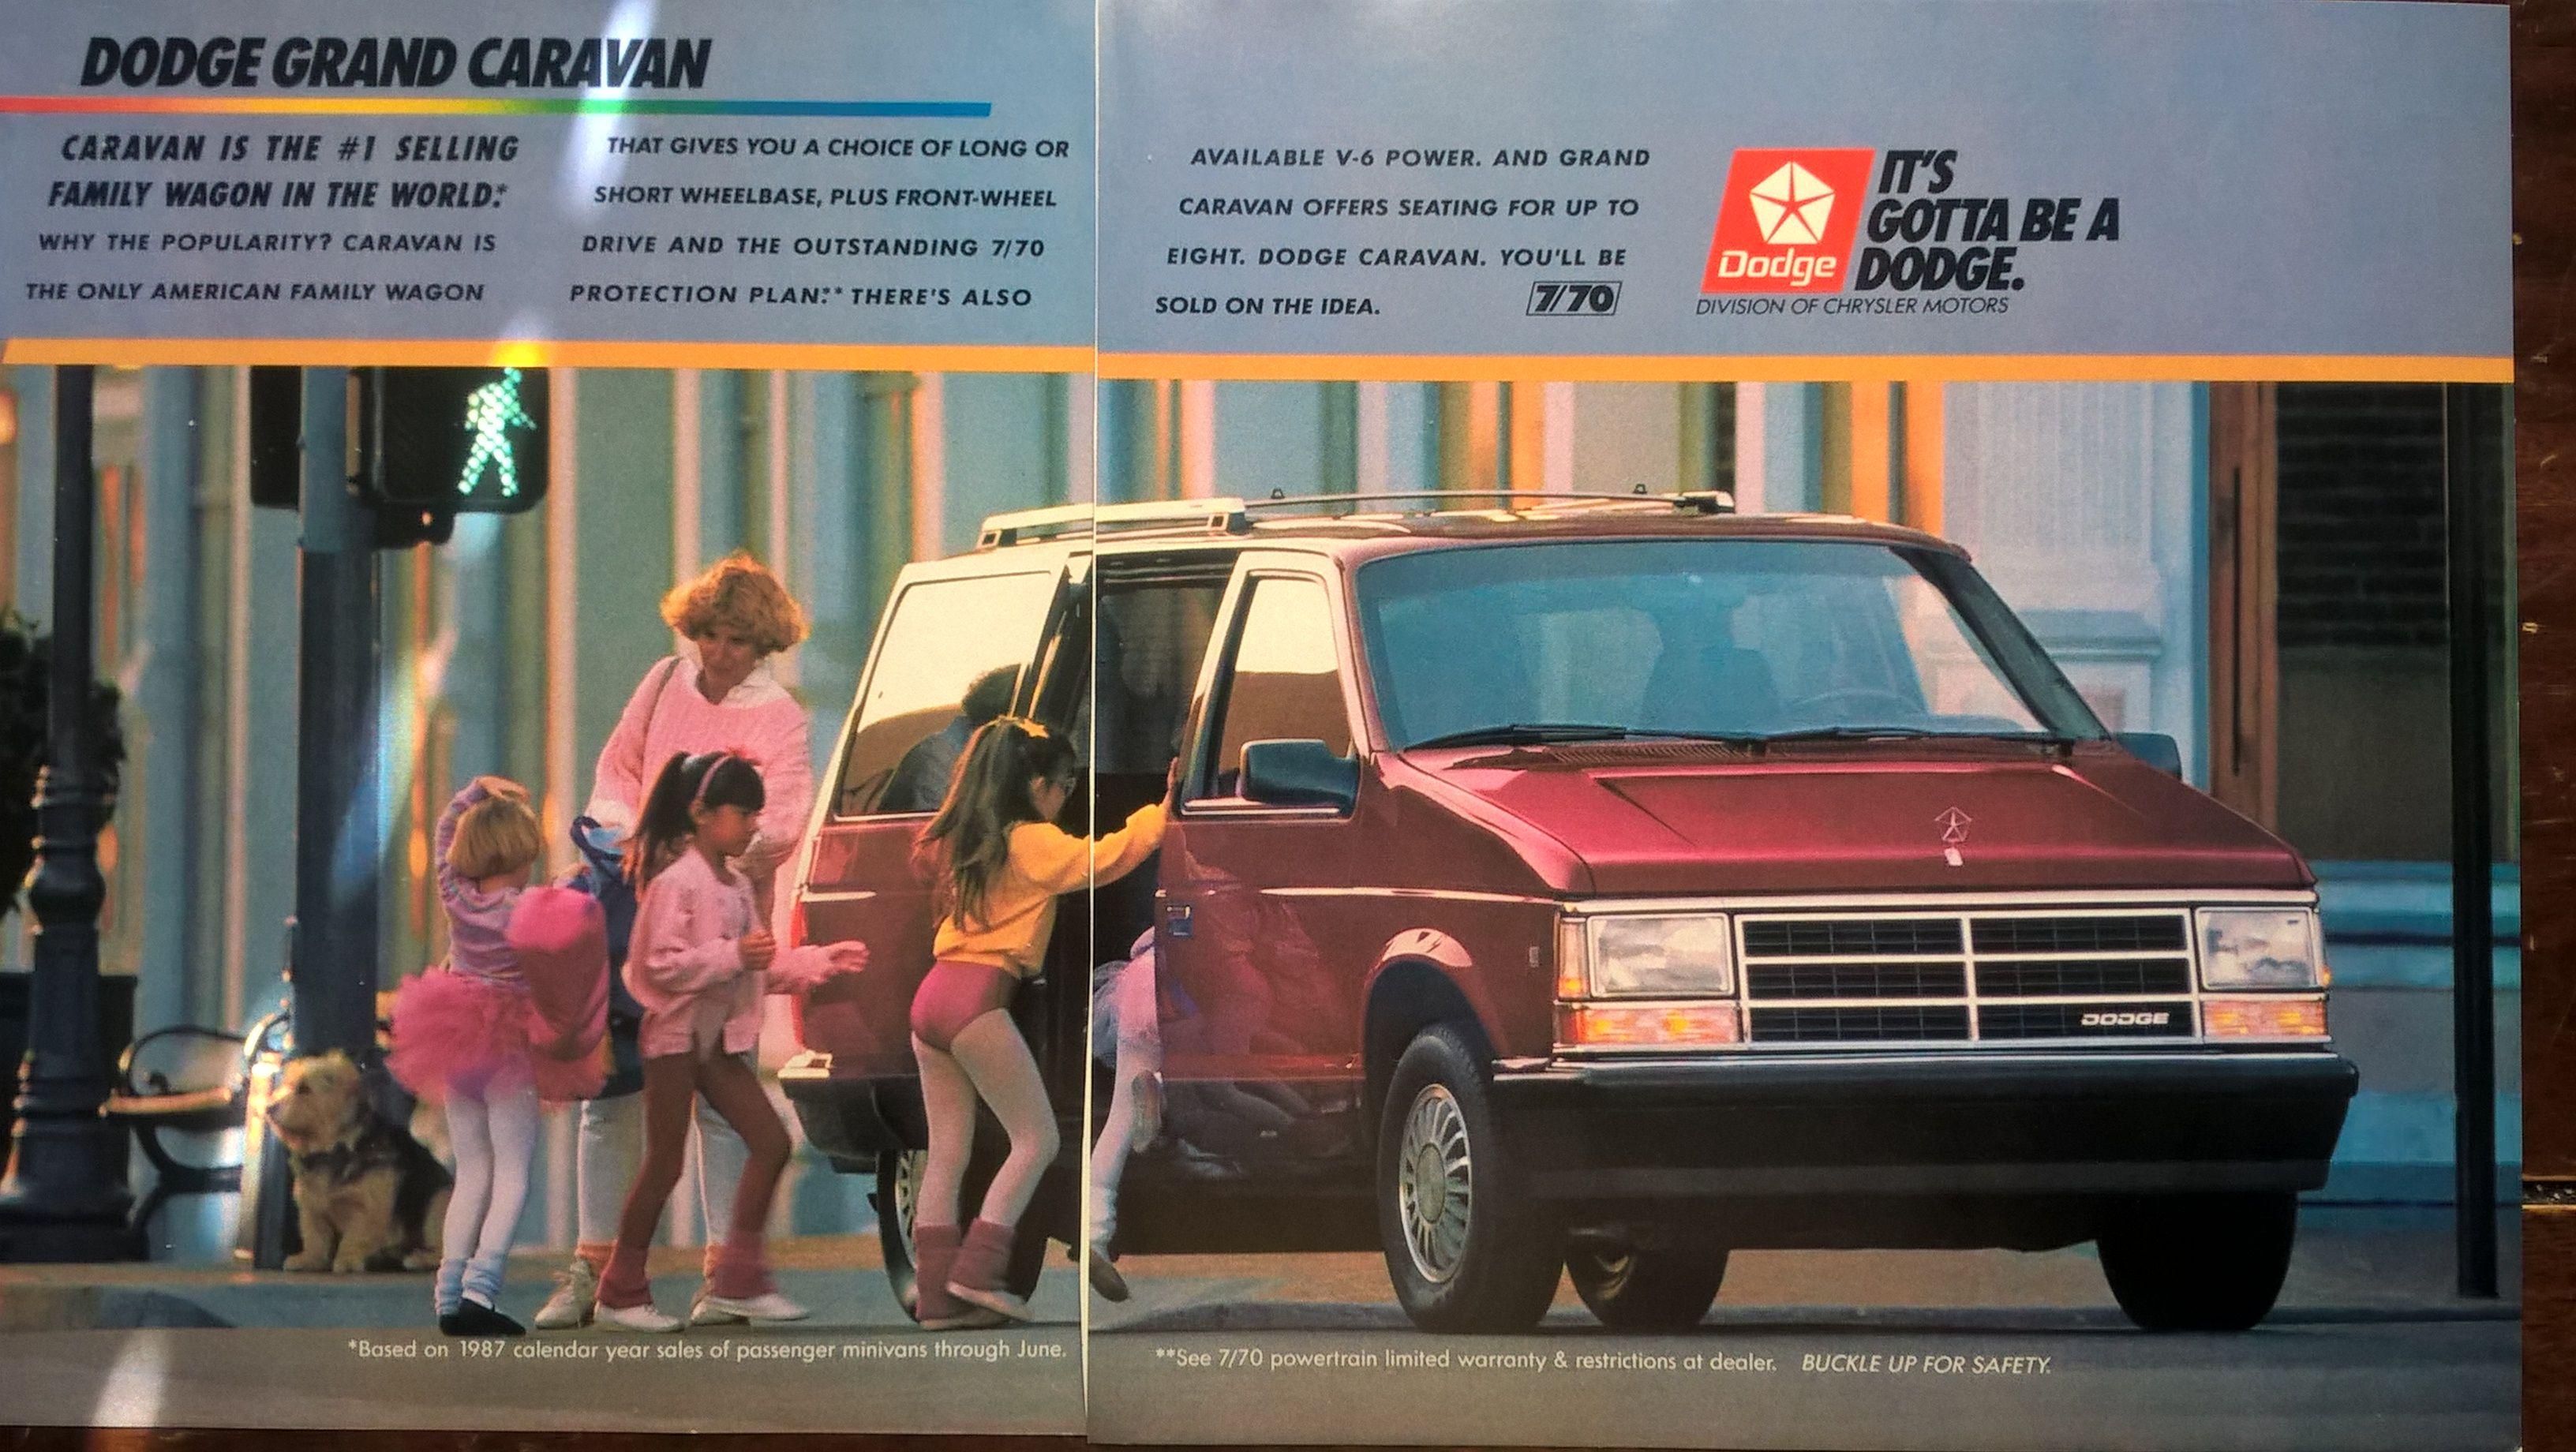 1988 Dodge Grand Carvan Ad National Geographic September 1988